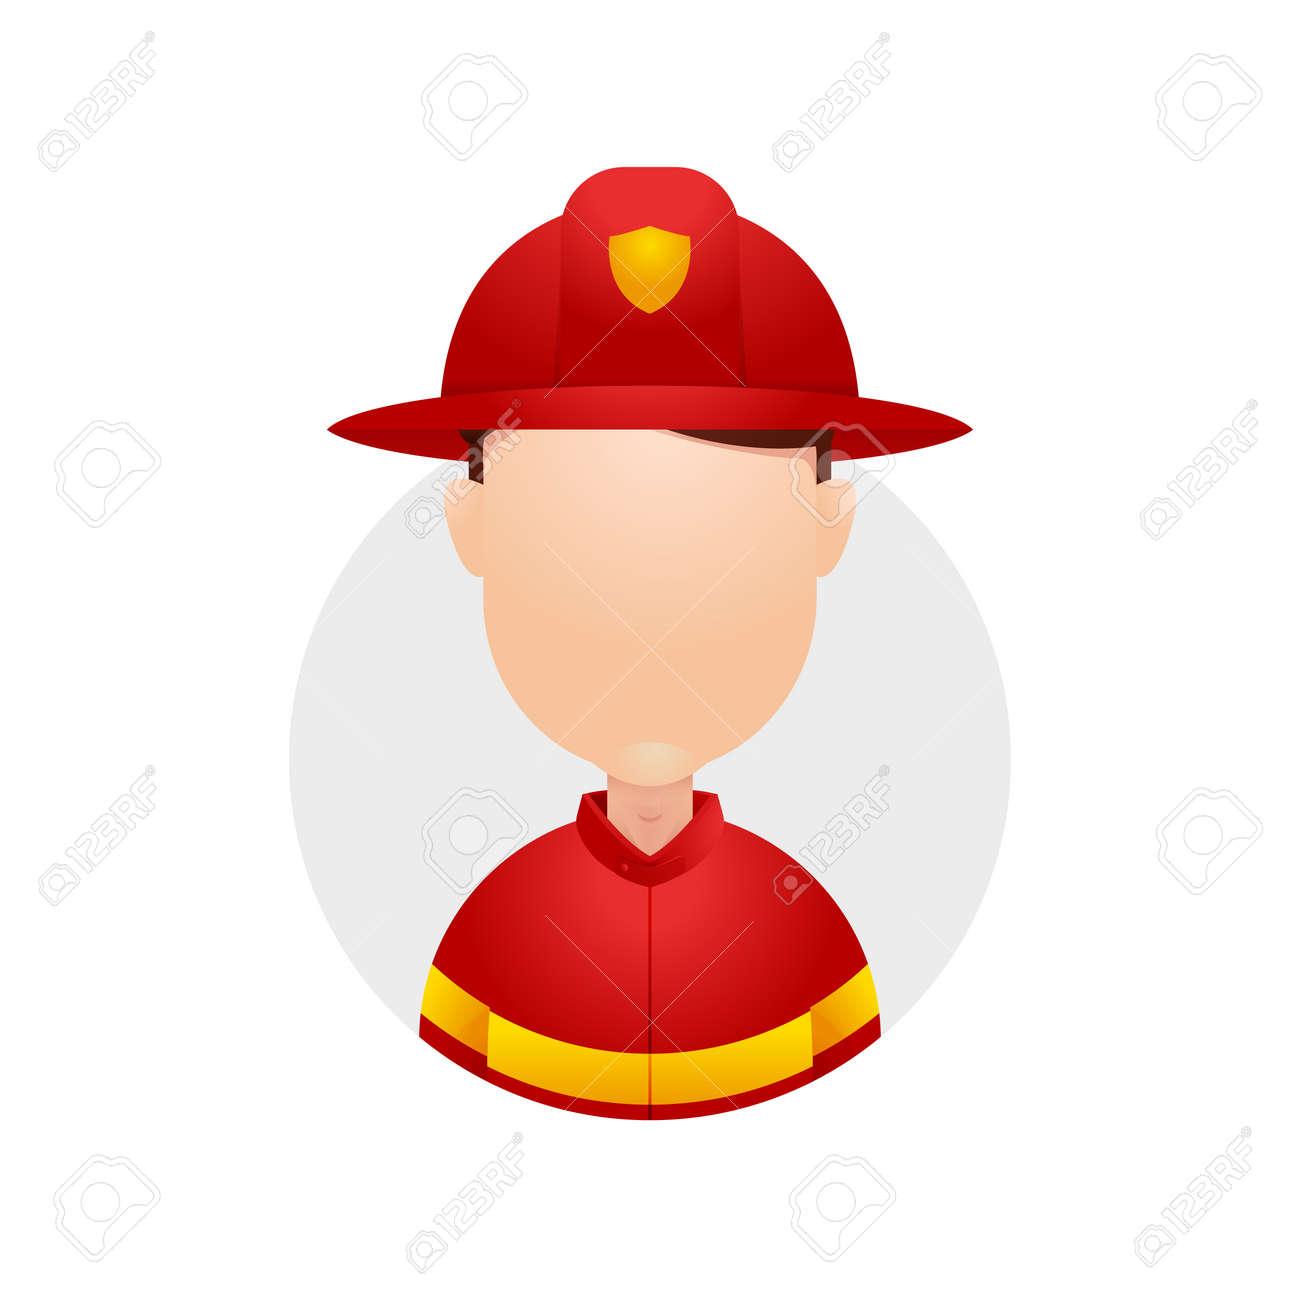 Firefighter fireman rescue hero red helmet uniform character job avatar  Stock Vector - 105639962 878bb23220b1